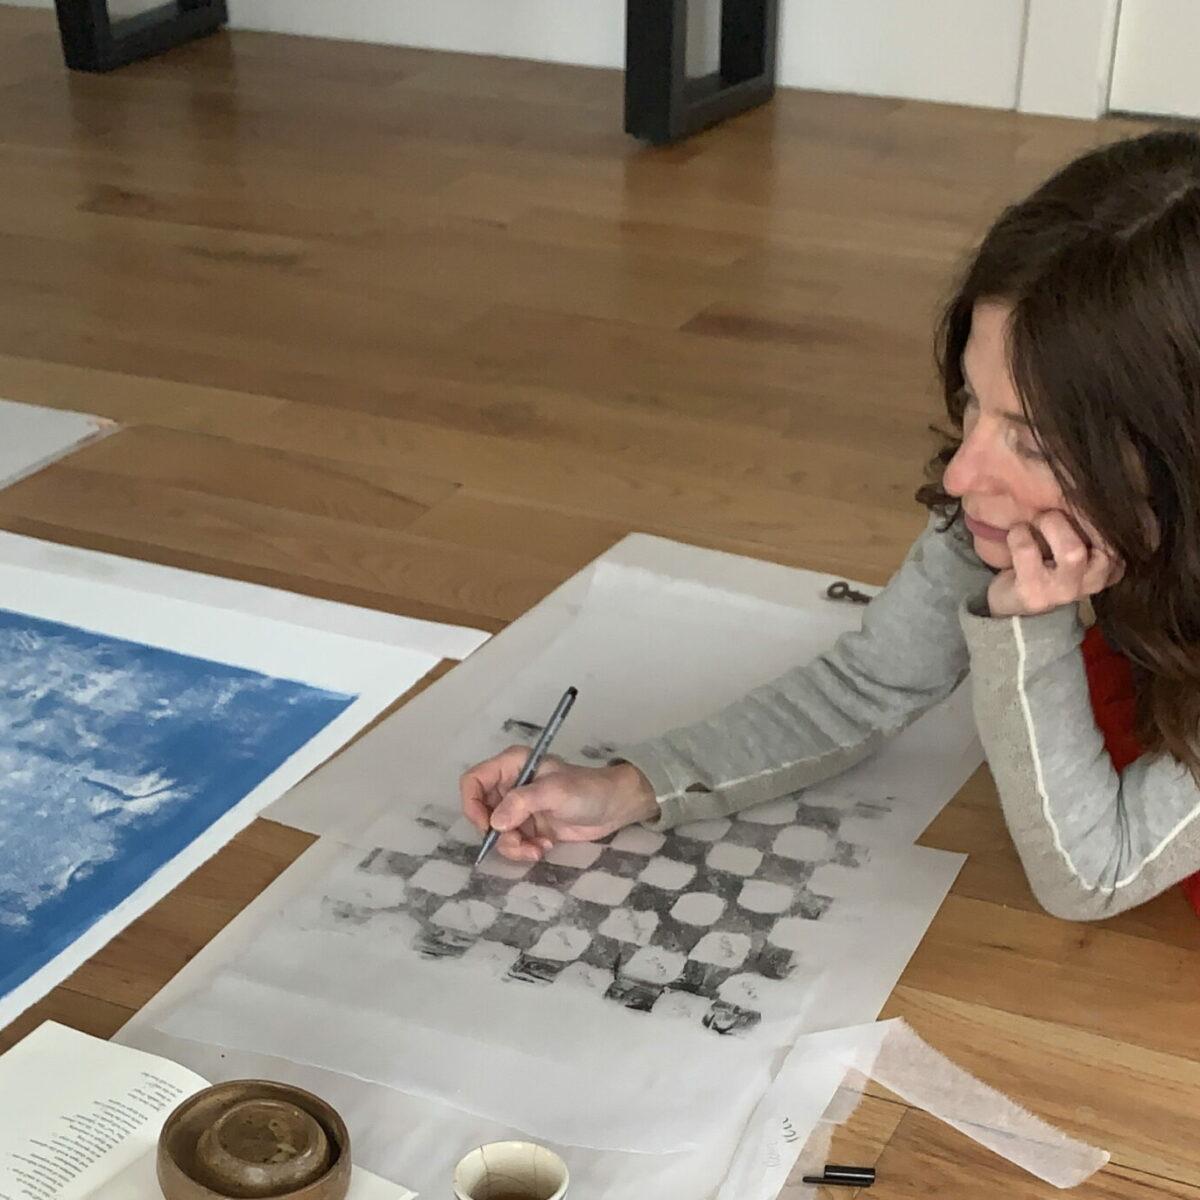 Belgin Yucelen Printmaking at her studio